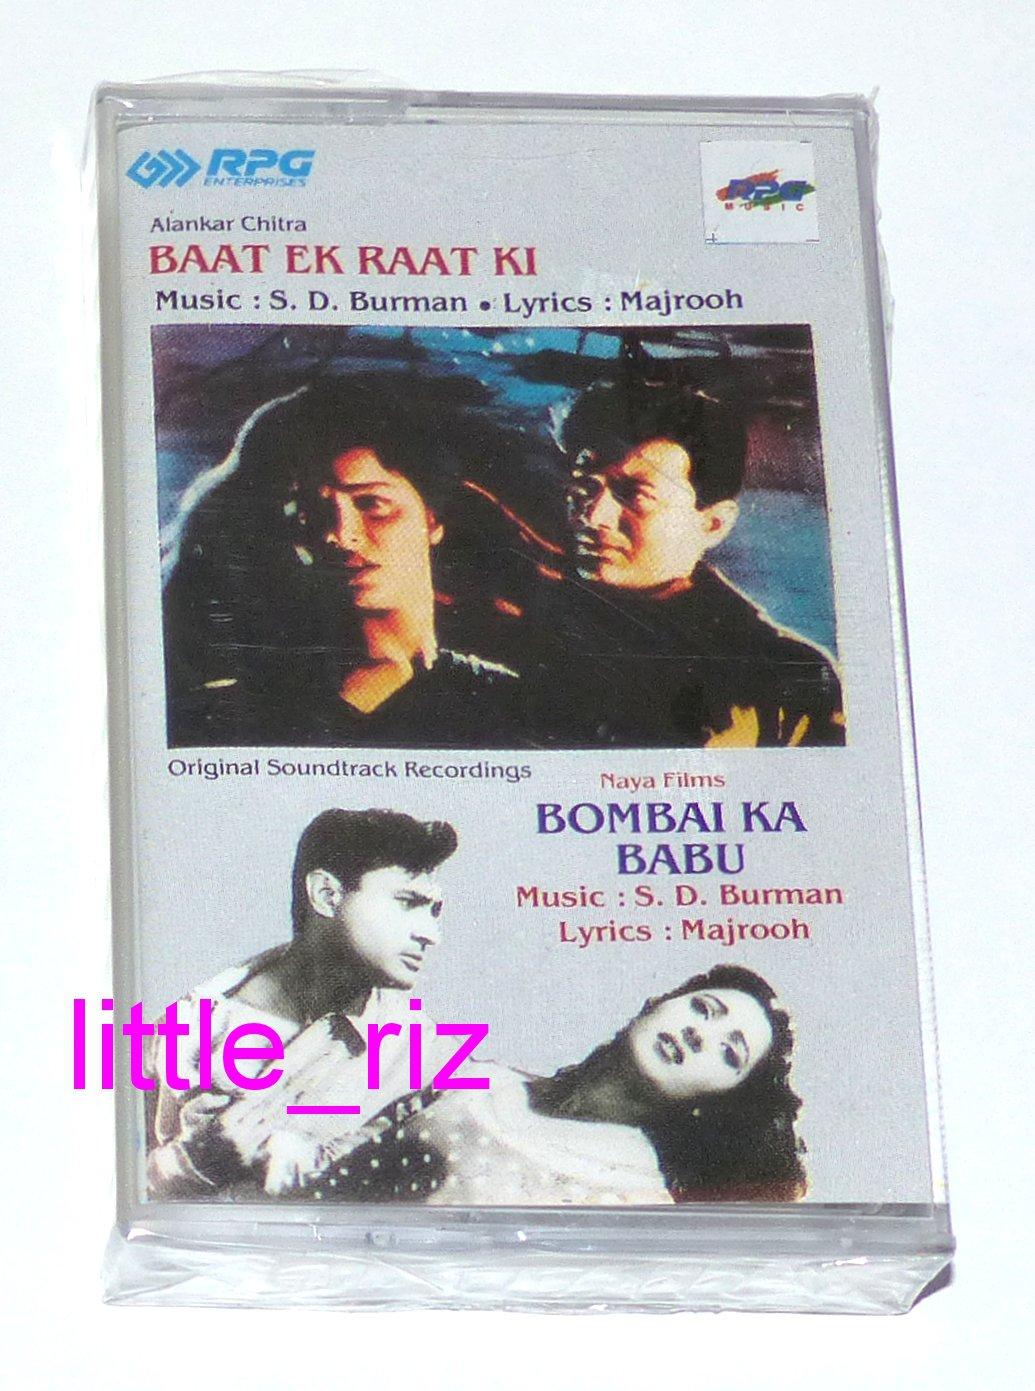 Baat Ek Raat Ki (1962) / Bombai Ka Babu (1960) � Bollywood Indian Cassette Tape S.D. Burman